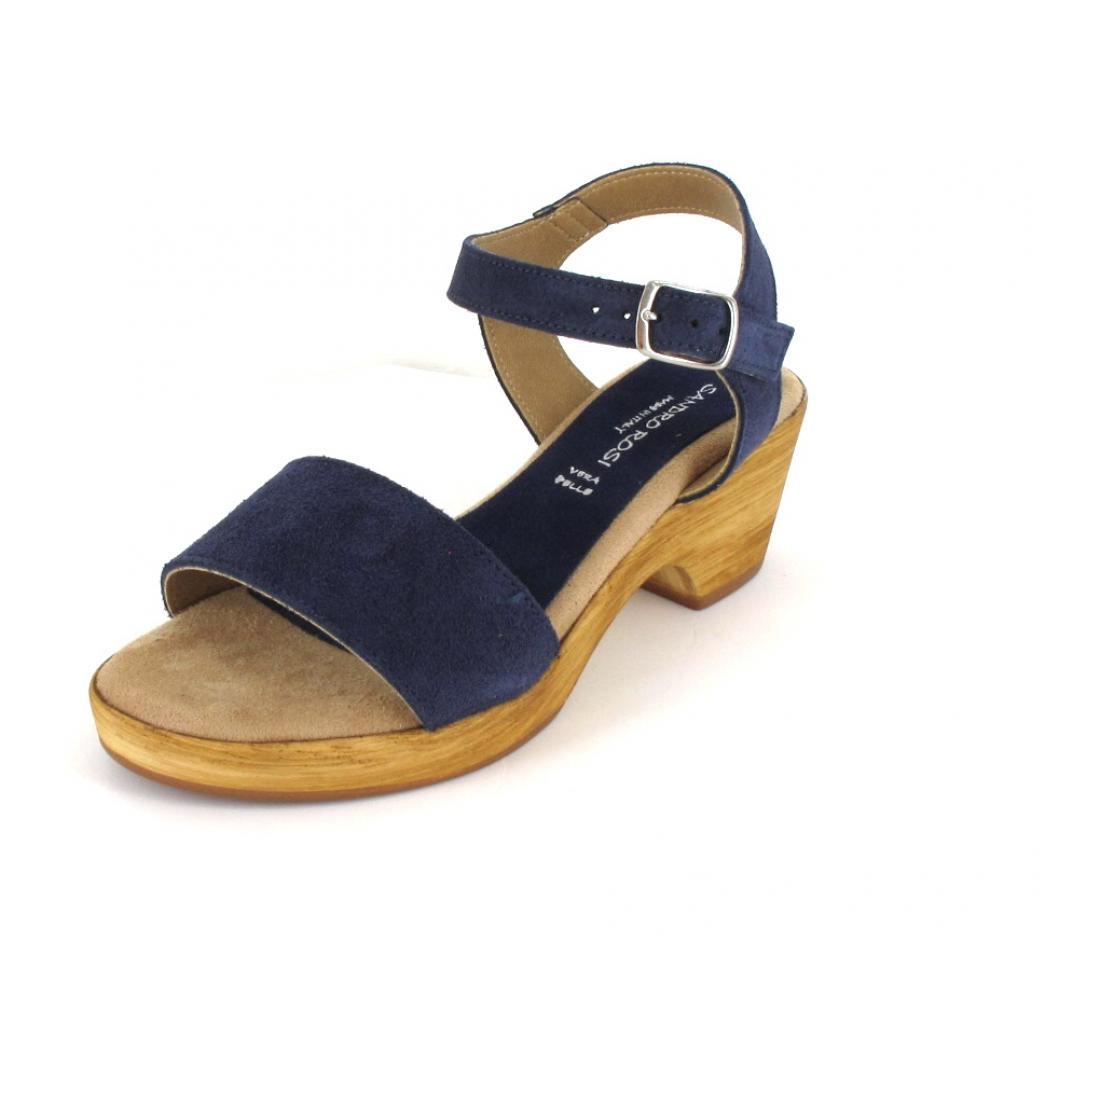 Sandy Shoes Sandale Crosta Sacamoscia blu